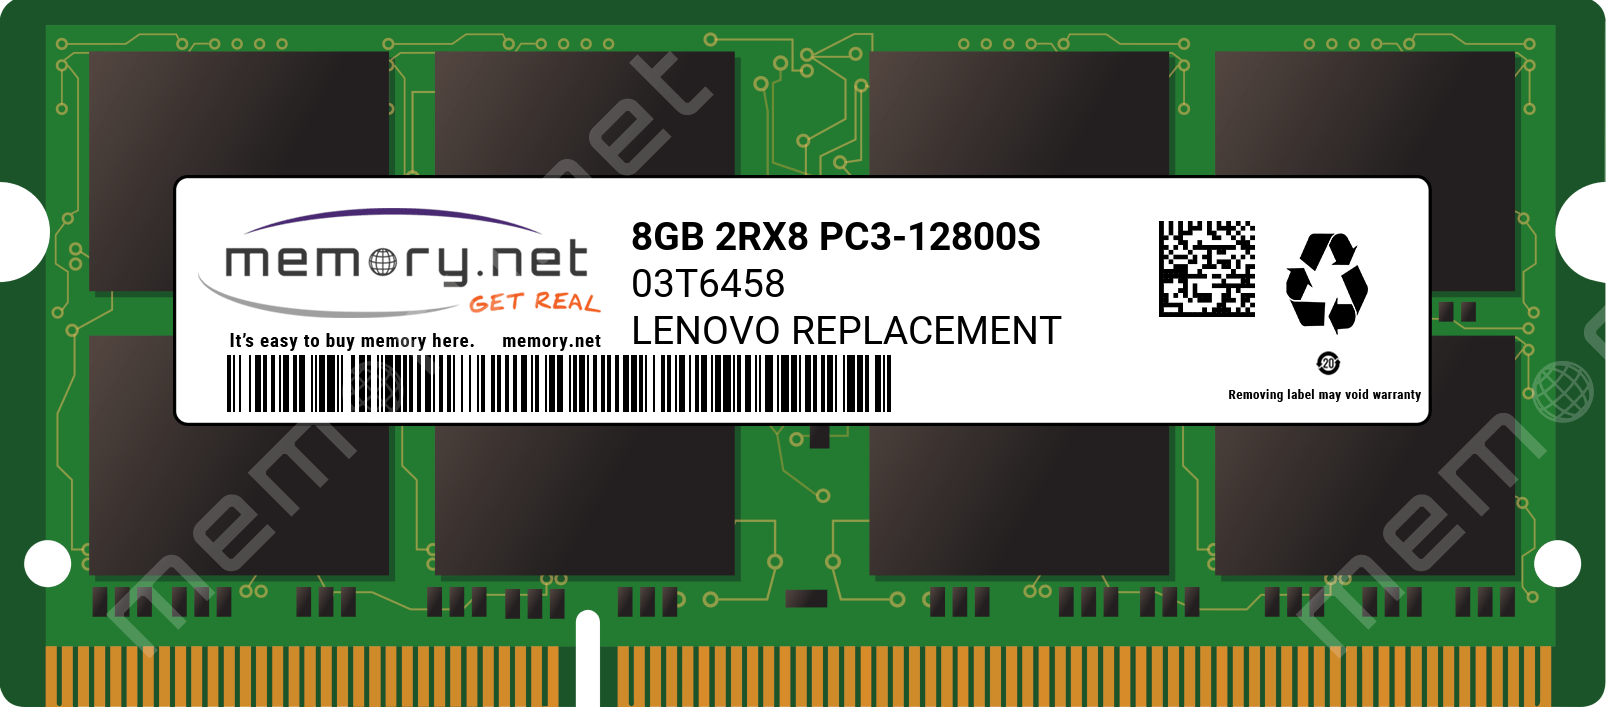 03T6458